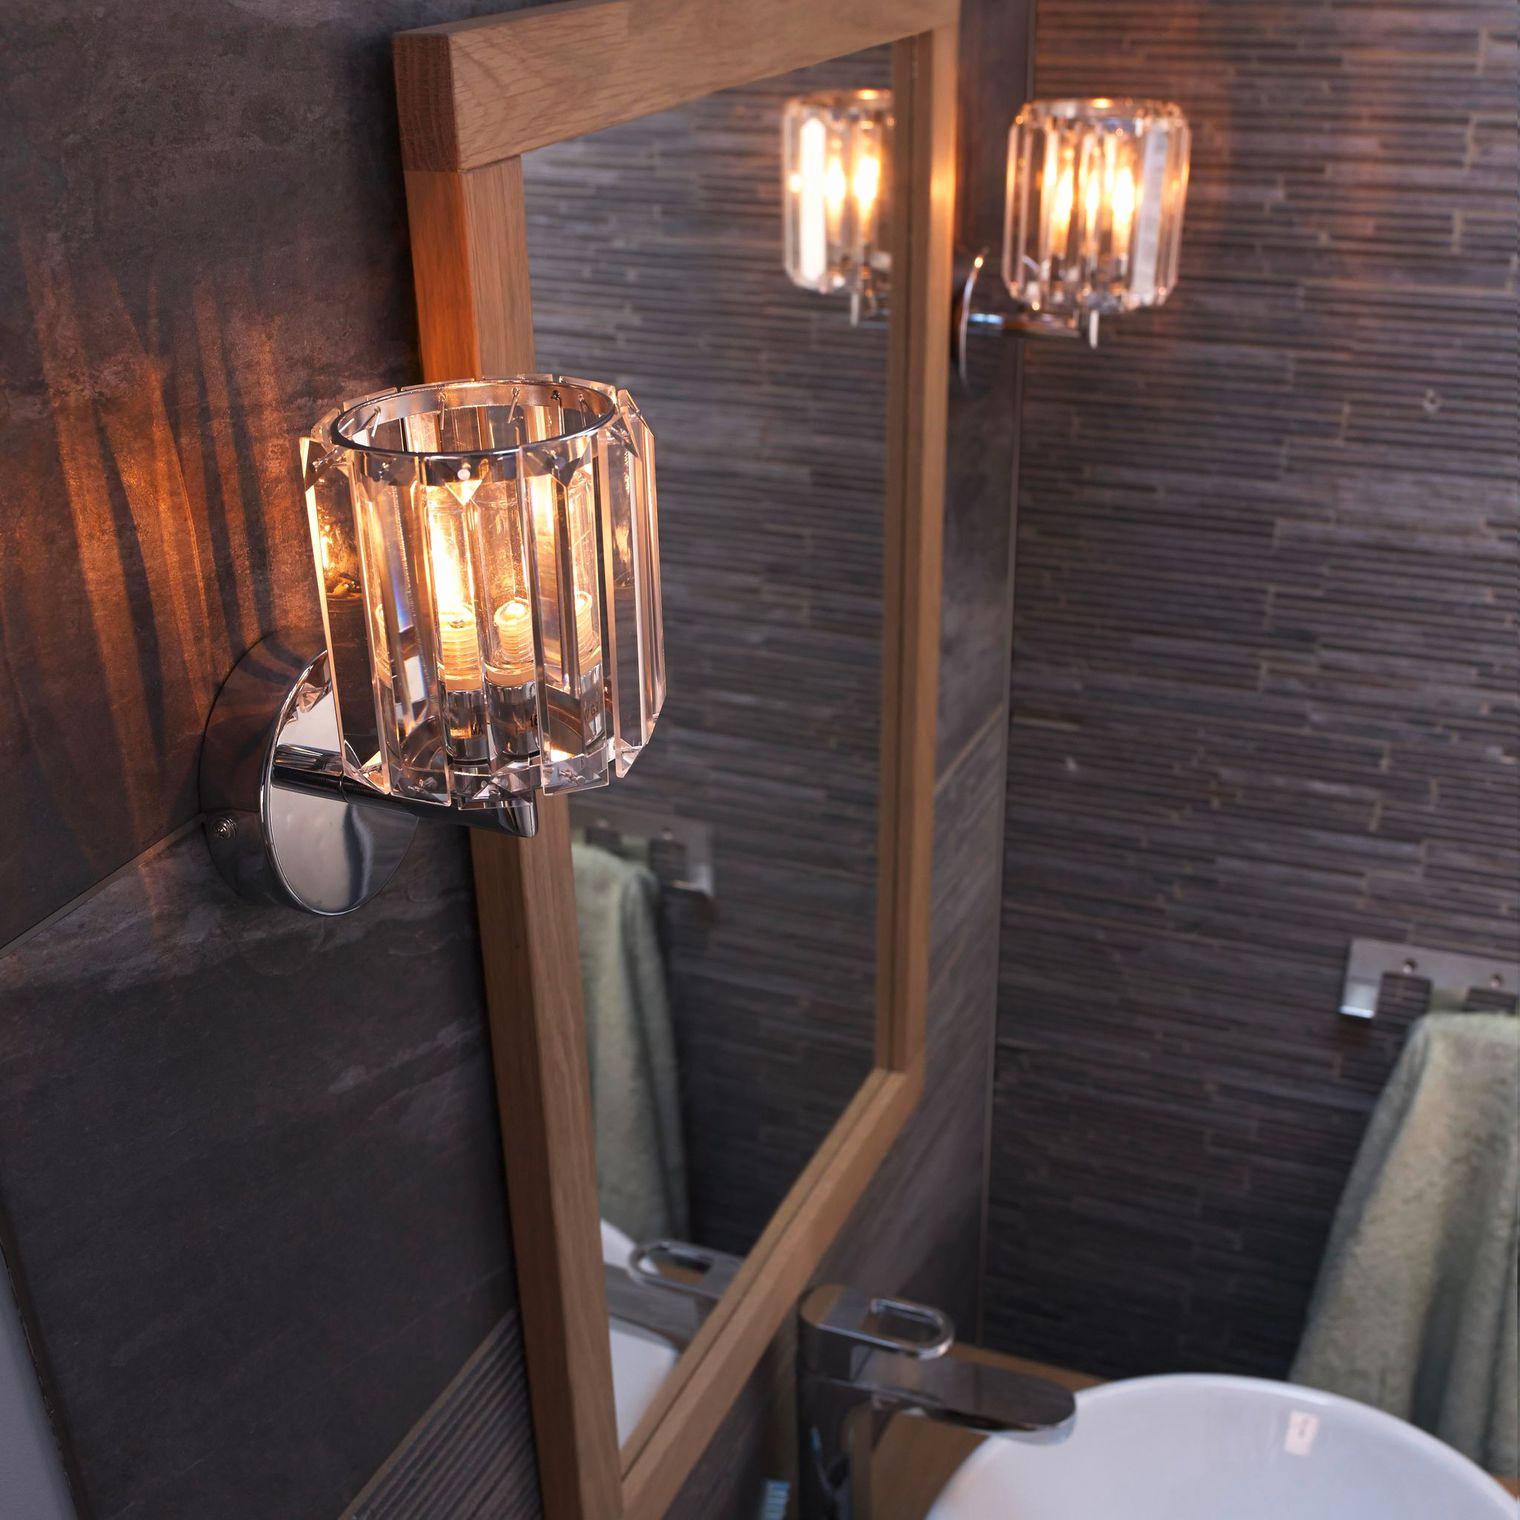 Lampe Salle De Bain Castorama Unique Photos Applique Salle De Bain Castorama Nouveau Applique Salle De Bain